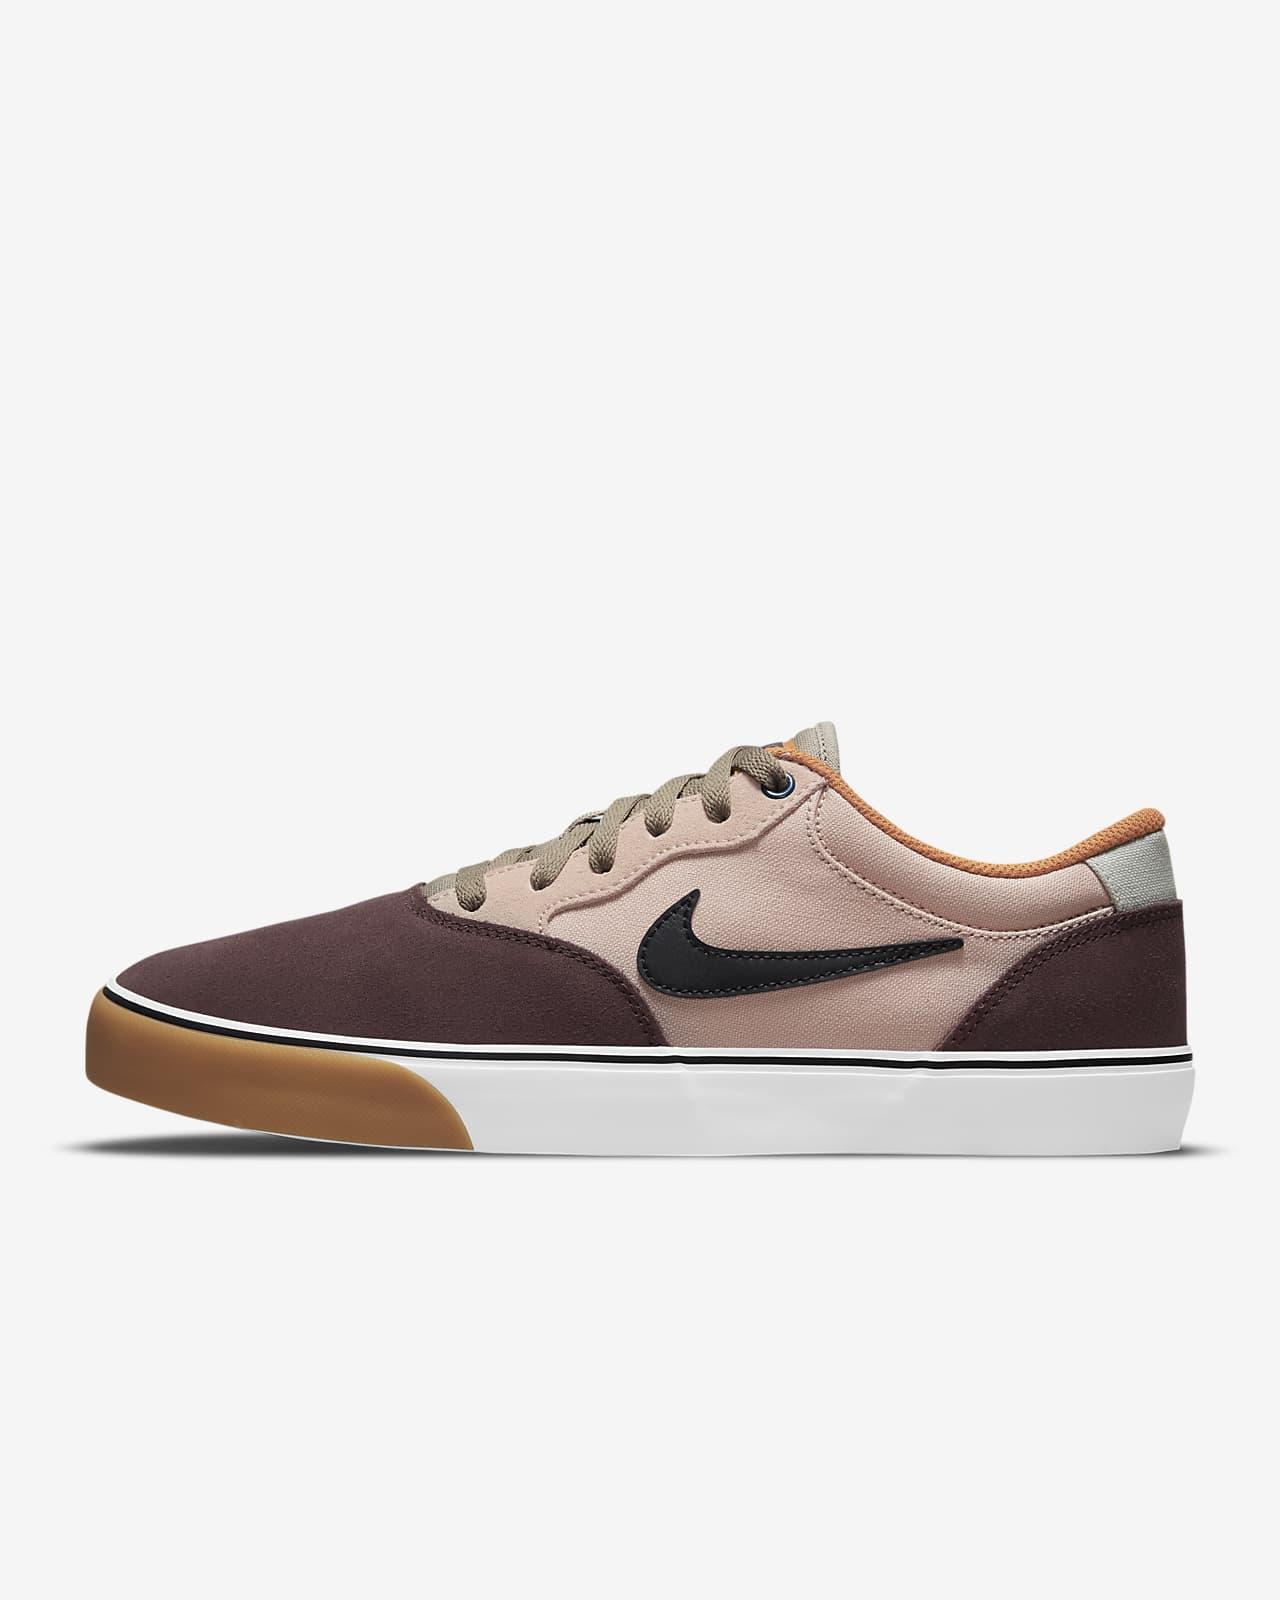 Chaussure de skateboard Nike SB Chron 2